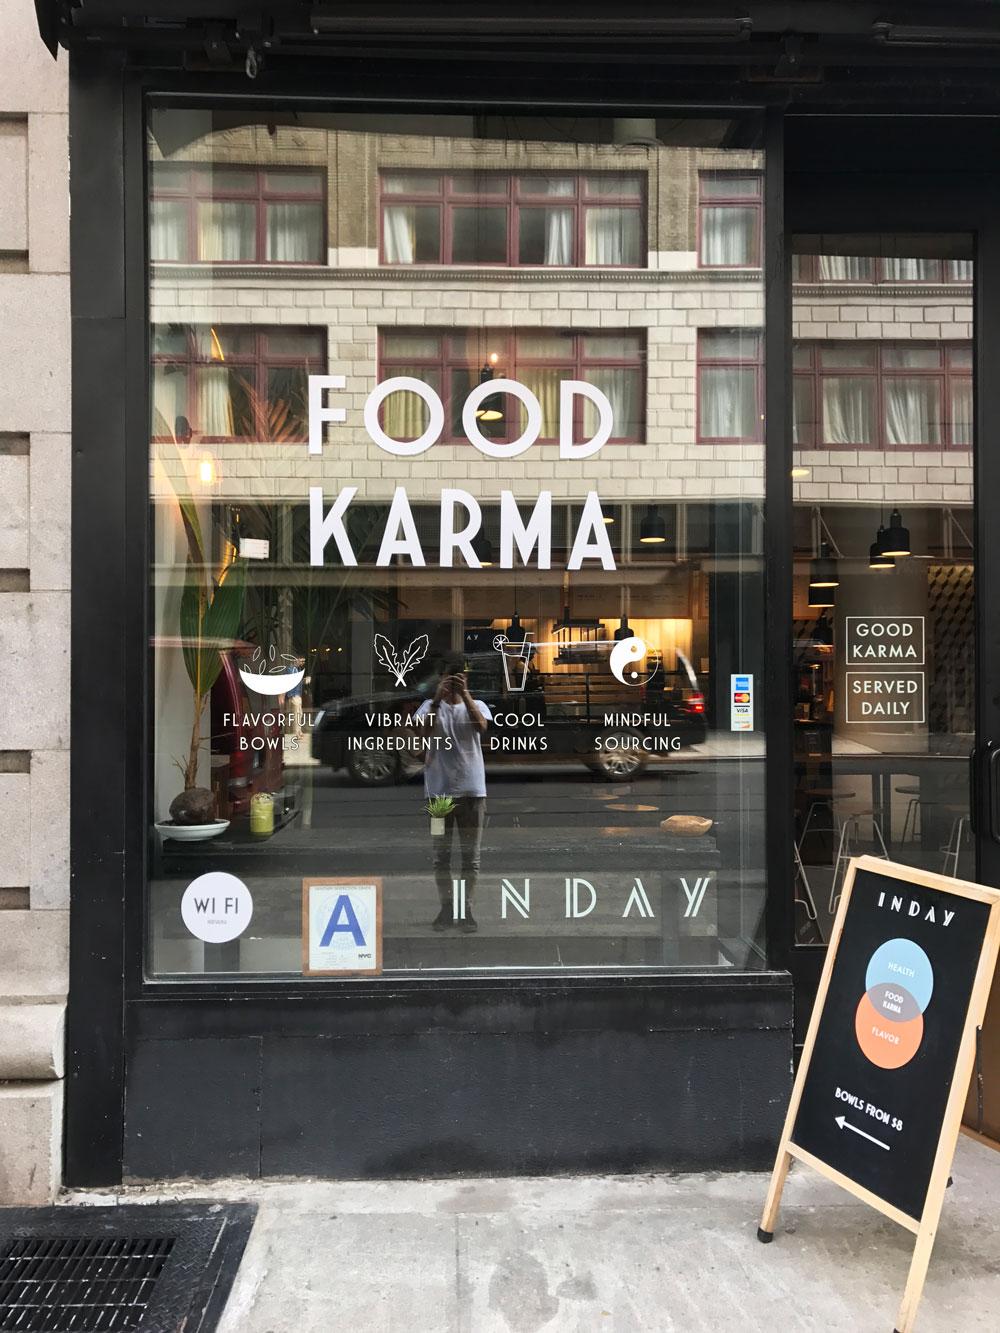 dominick-volini-inday-food-karma-1.jpg